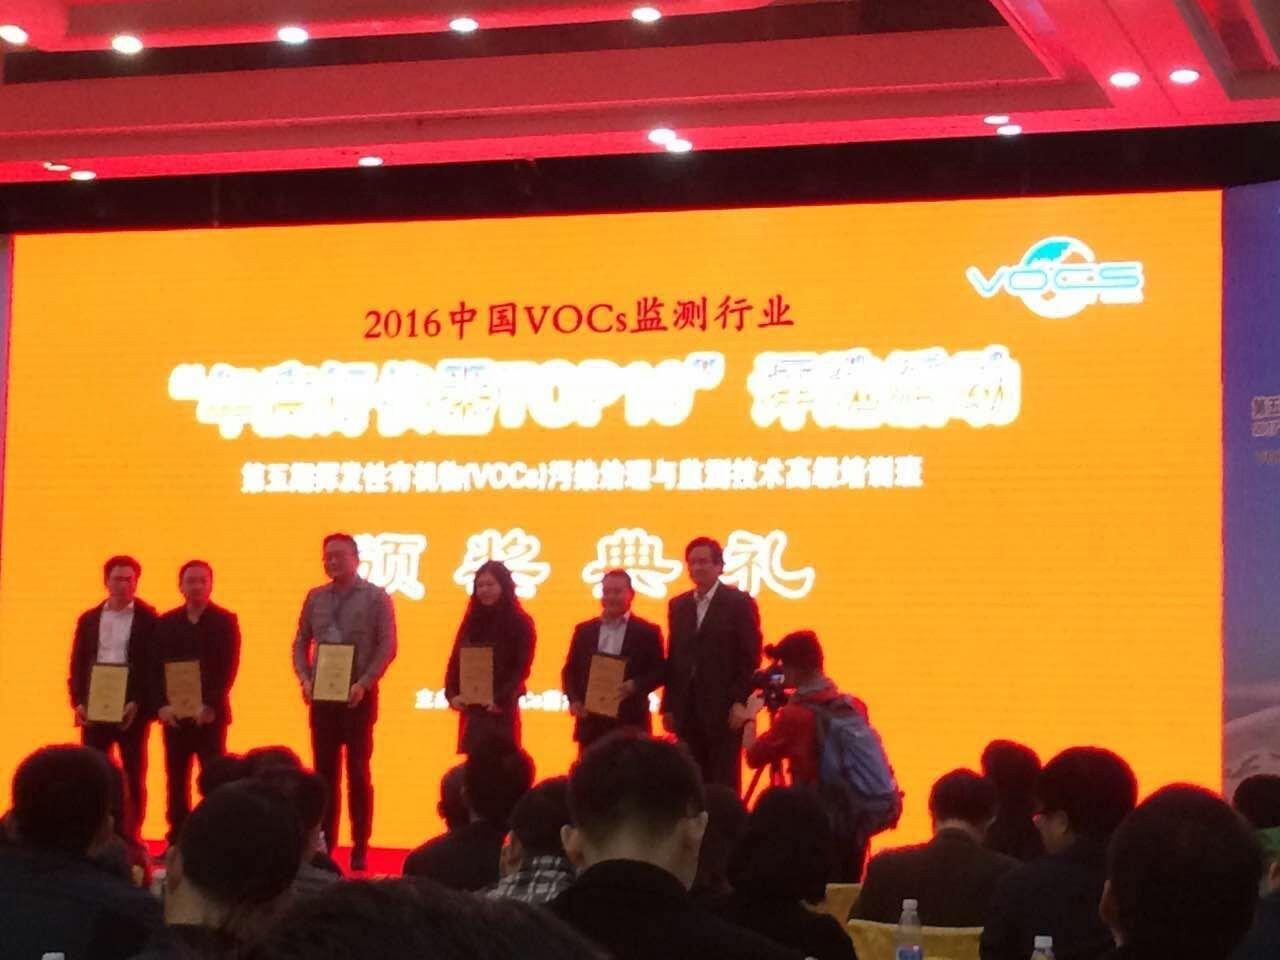 VOCs大奖颁奖典礼